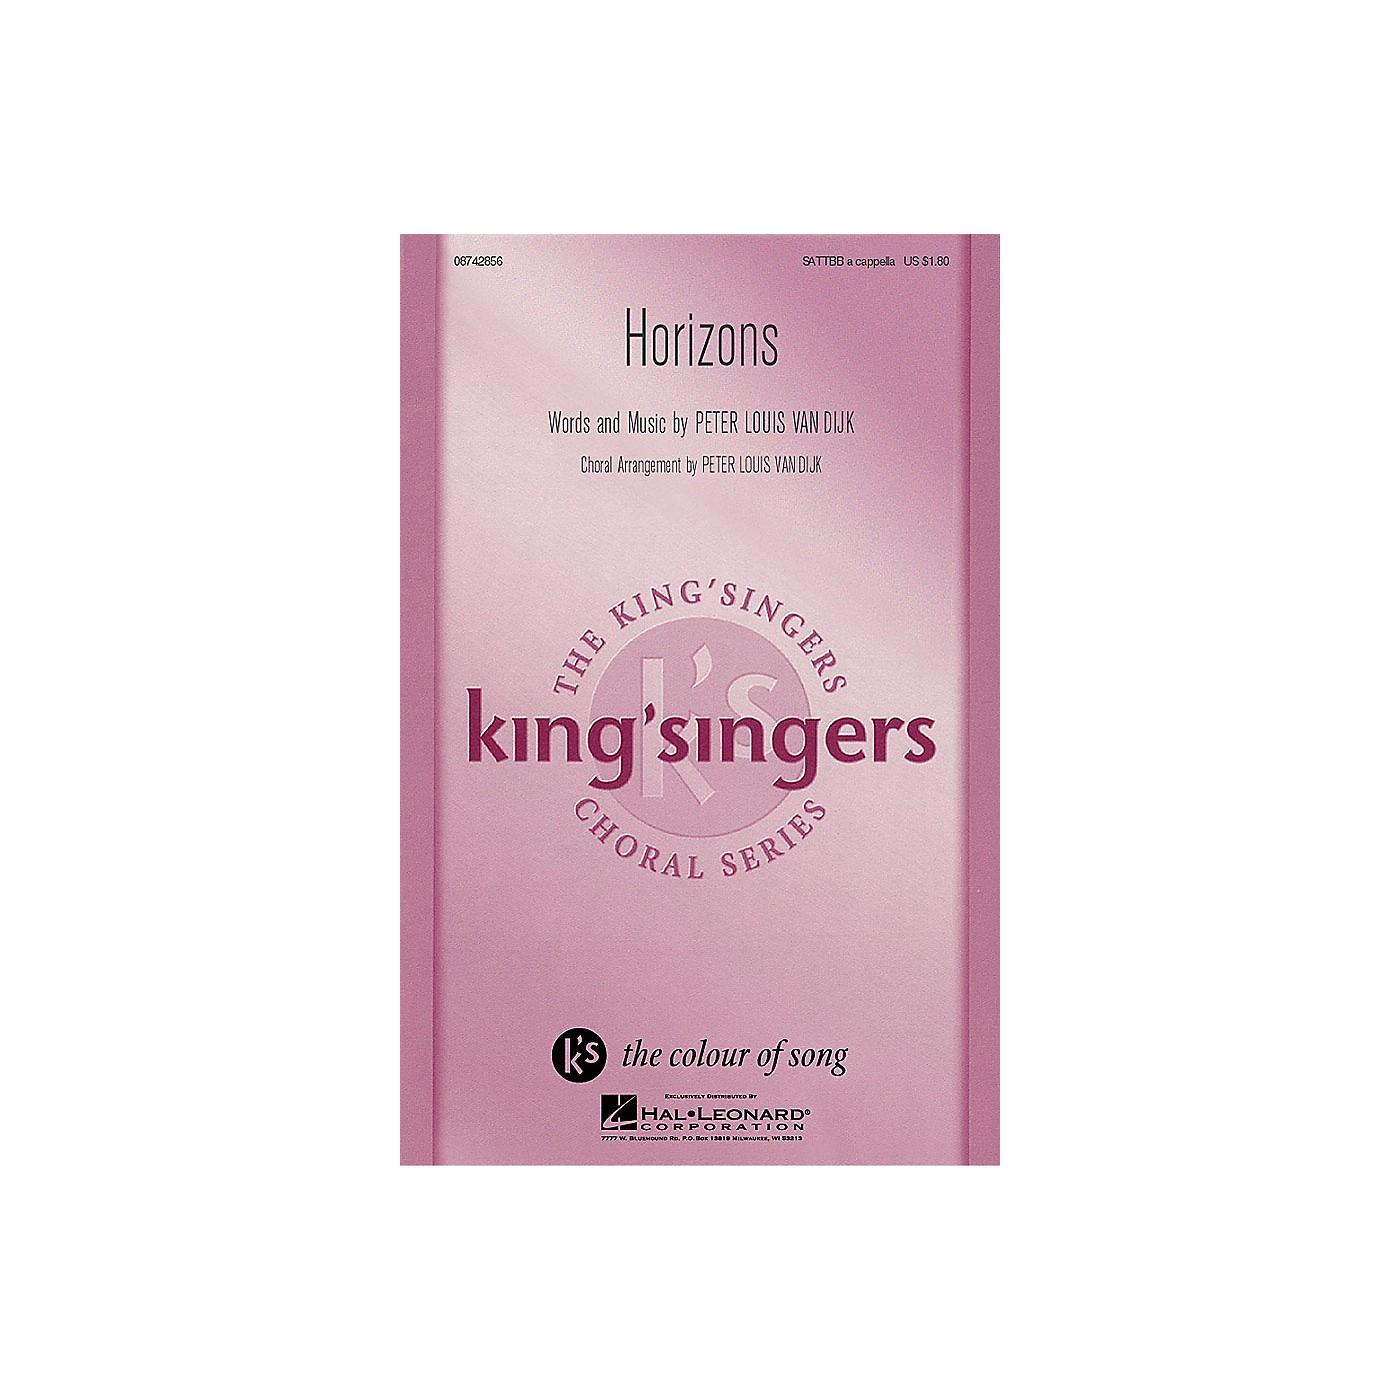 Hal Leonard Horizons SATTBB A Cappella arranged by Peter Louis van Dijk thumbnail